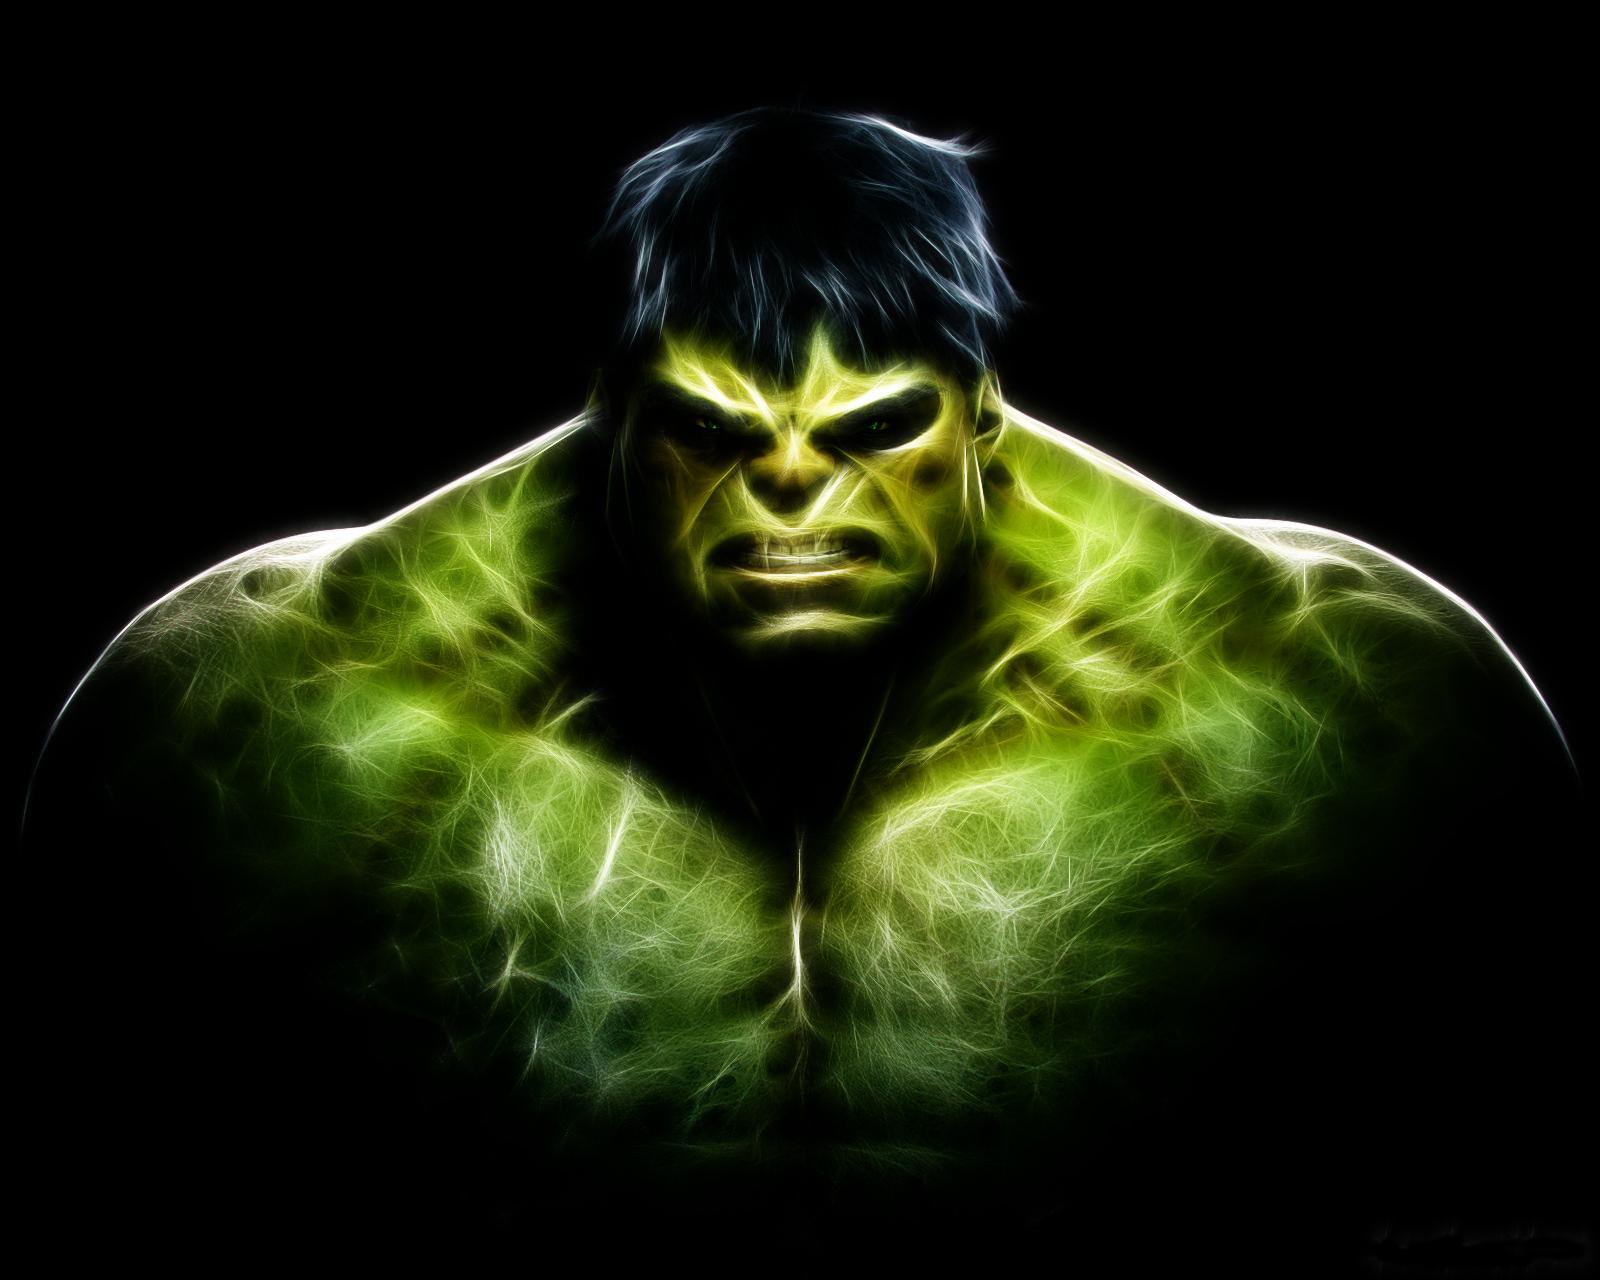 Incredible Hulk 3D HD Wallpaper HD Desktop Wallpaper for 1600x1280